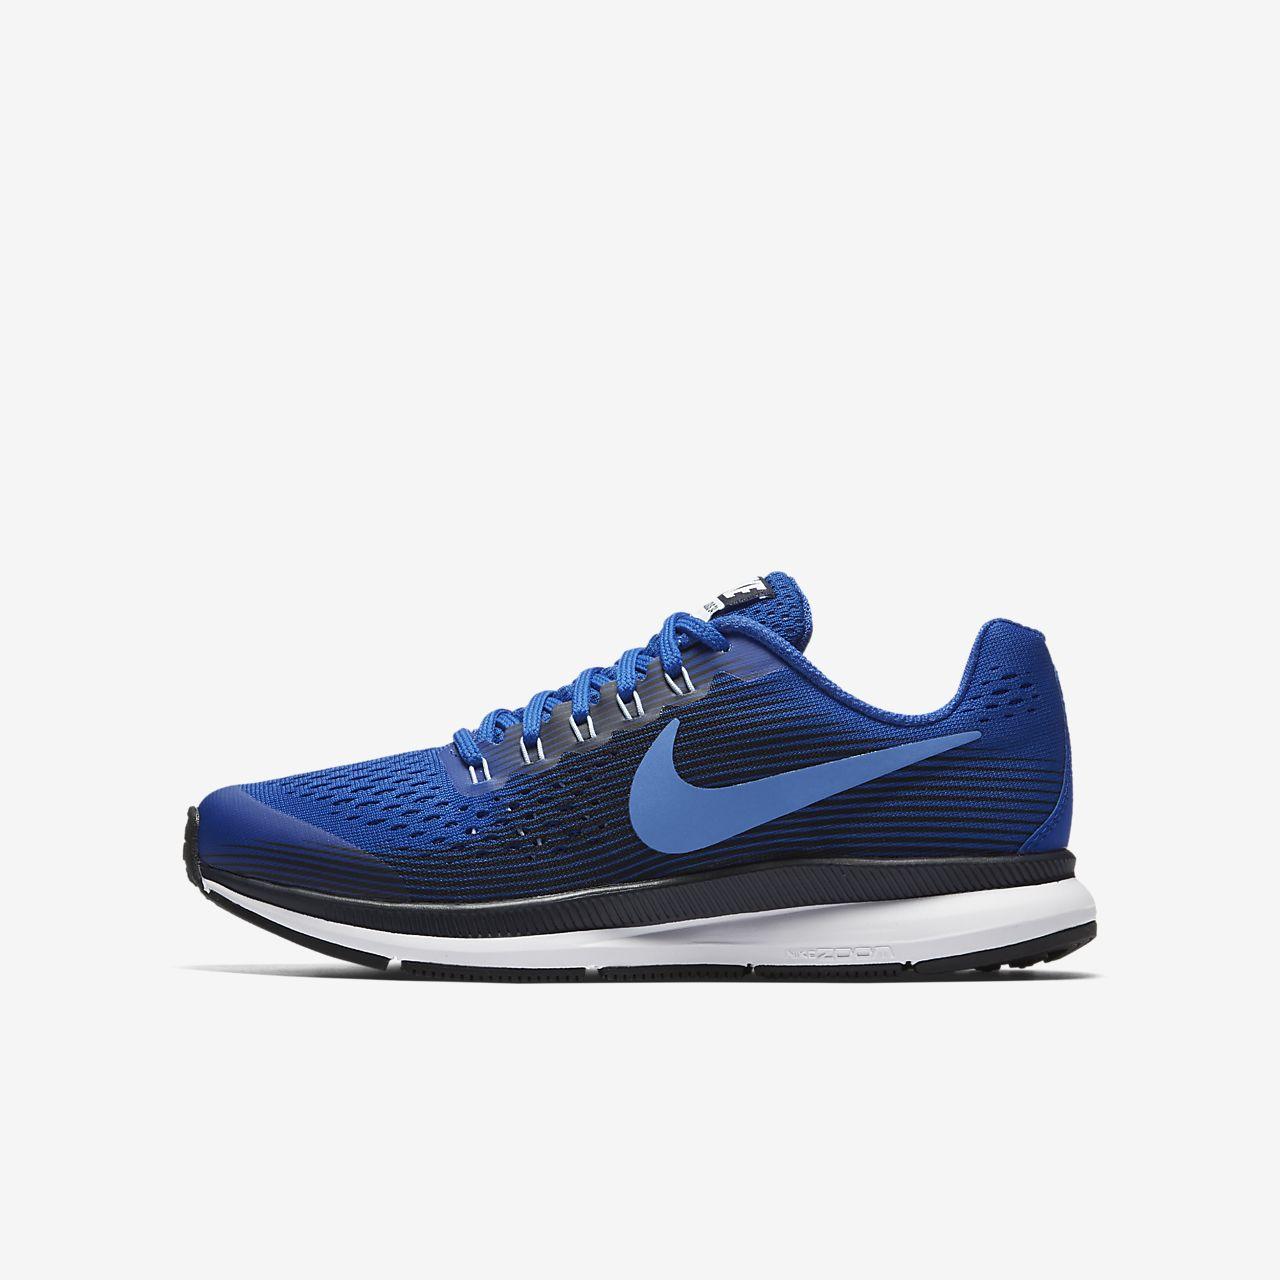 huge discount 92f03 db17e Kids  Running Shoe. Nike Zoom Pegasus 34